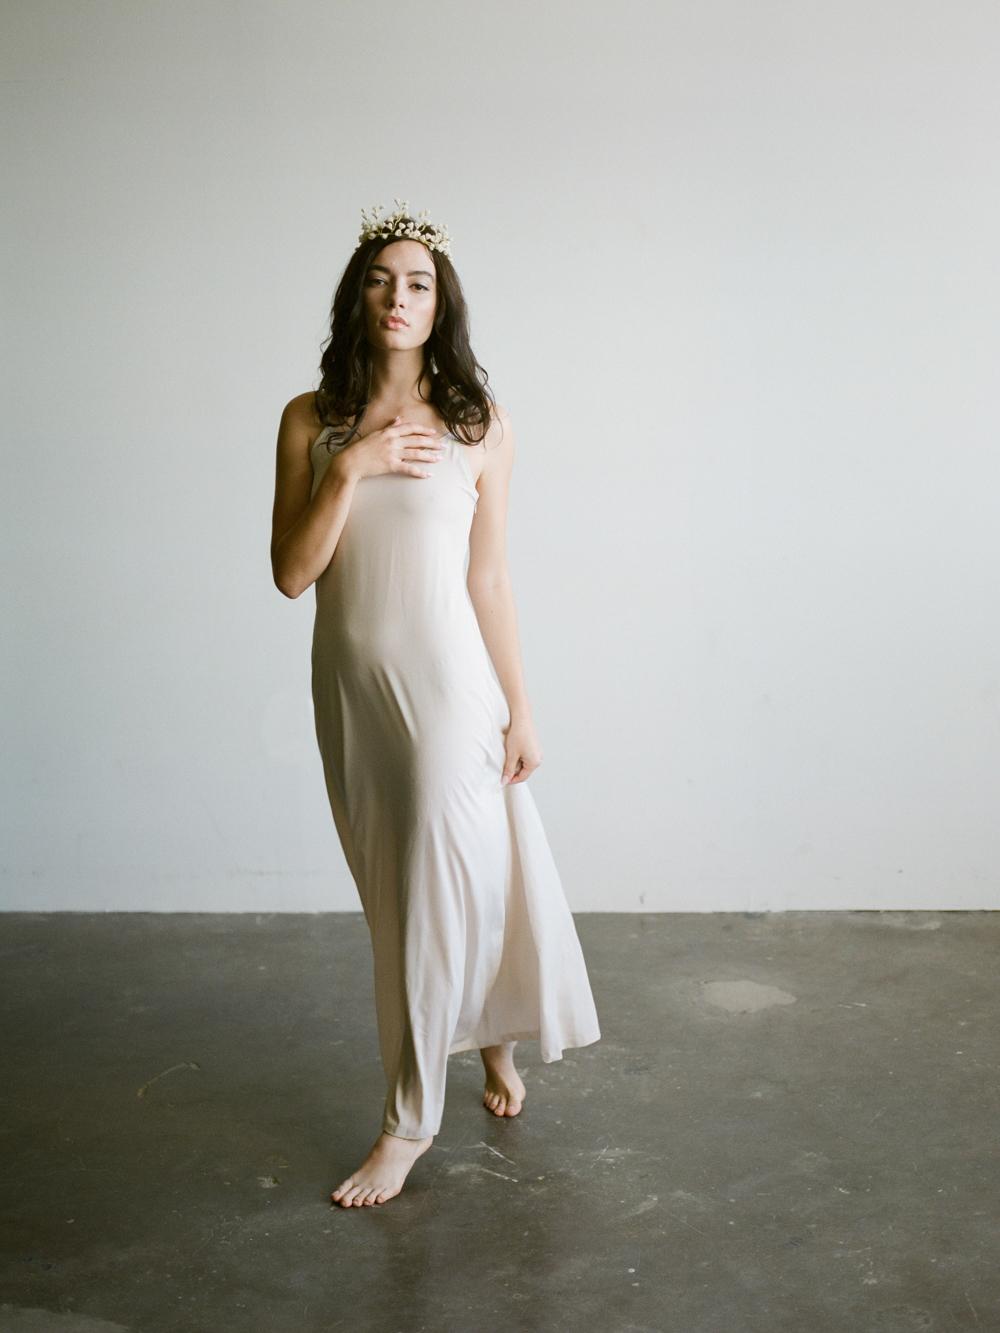 Christine Gosch - Erin Rhyne - film photographer - brand photographer - portrait photographer-10.jpg